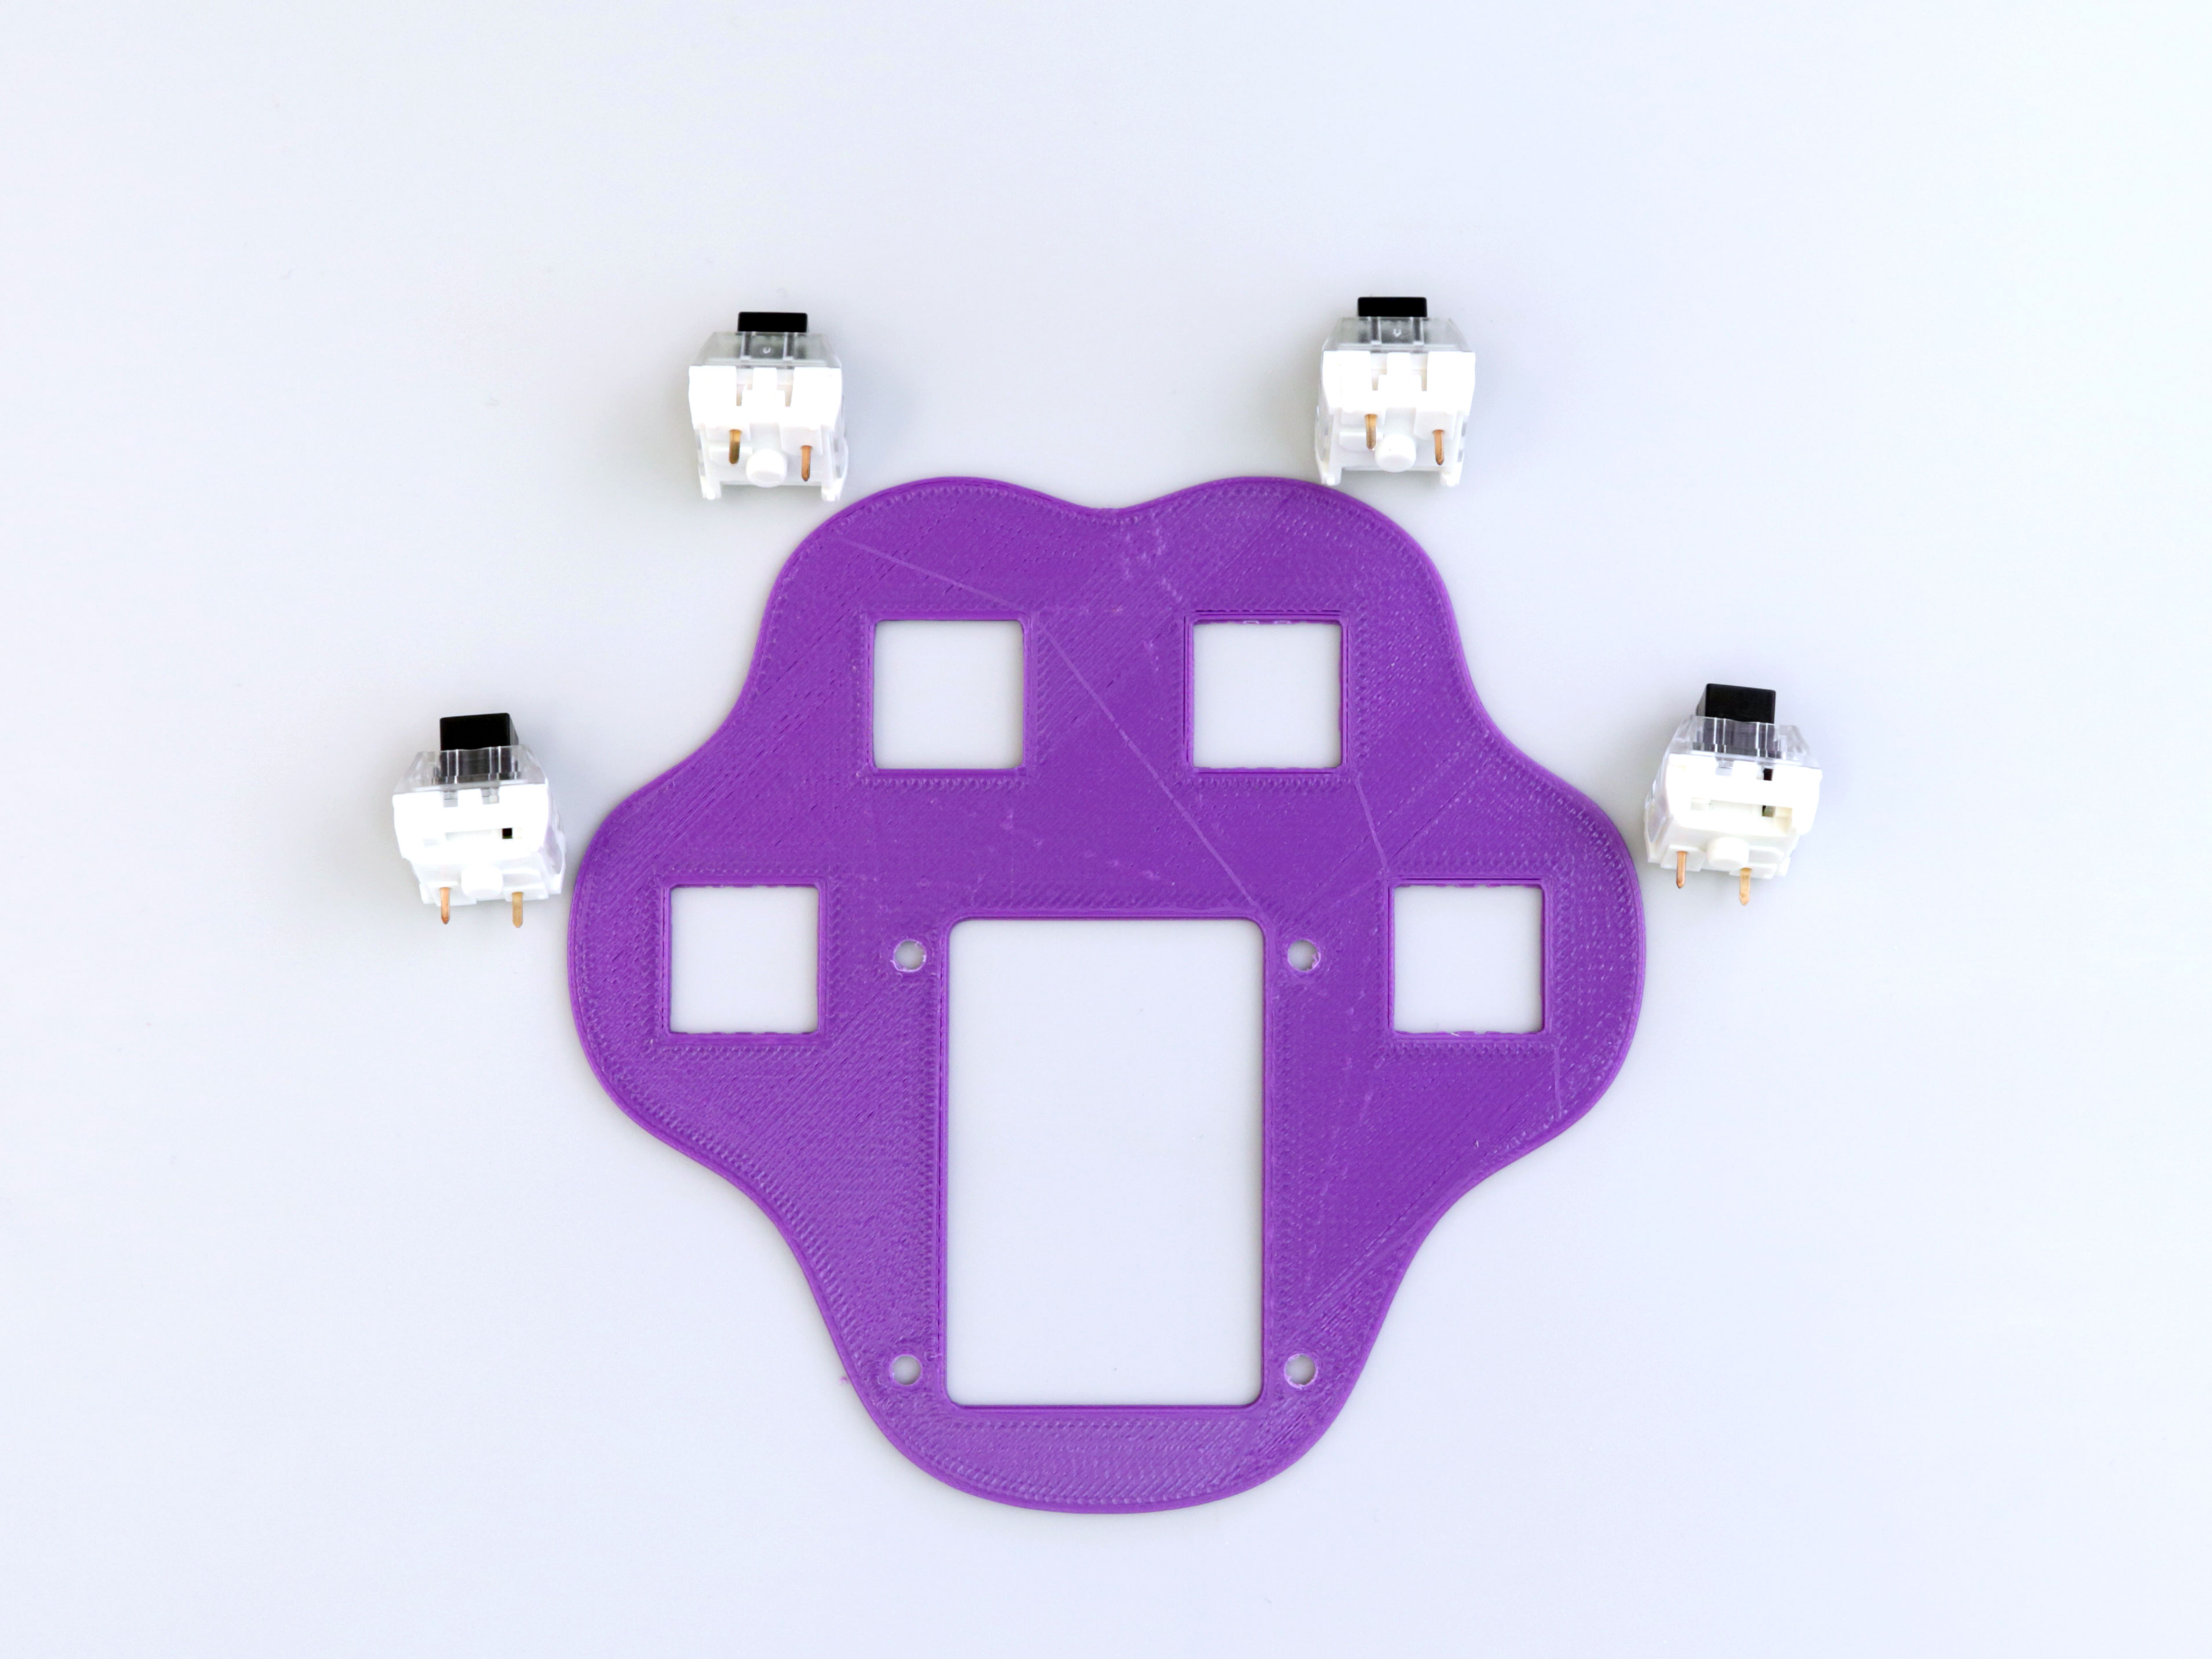 3d_printing_keyplate-switches.jpg